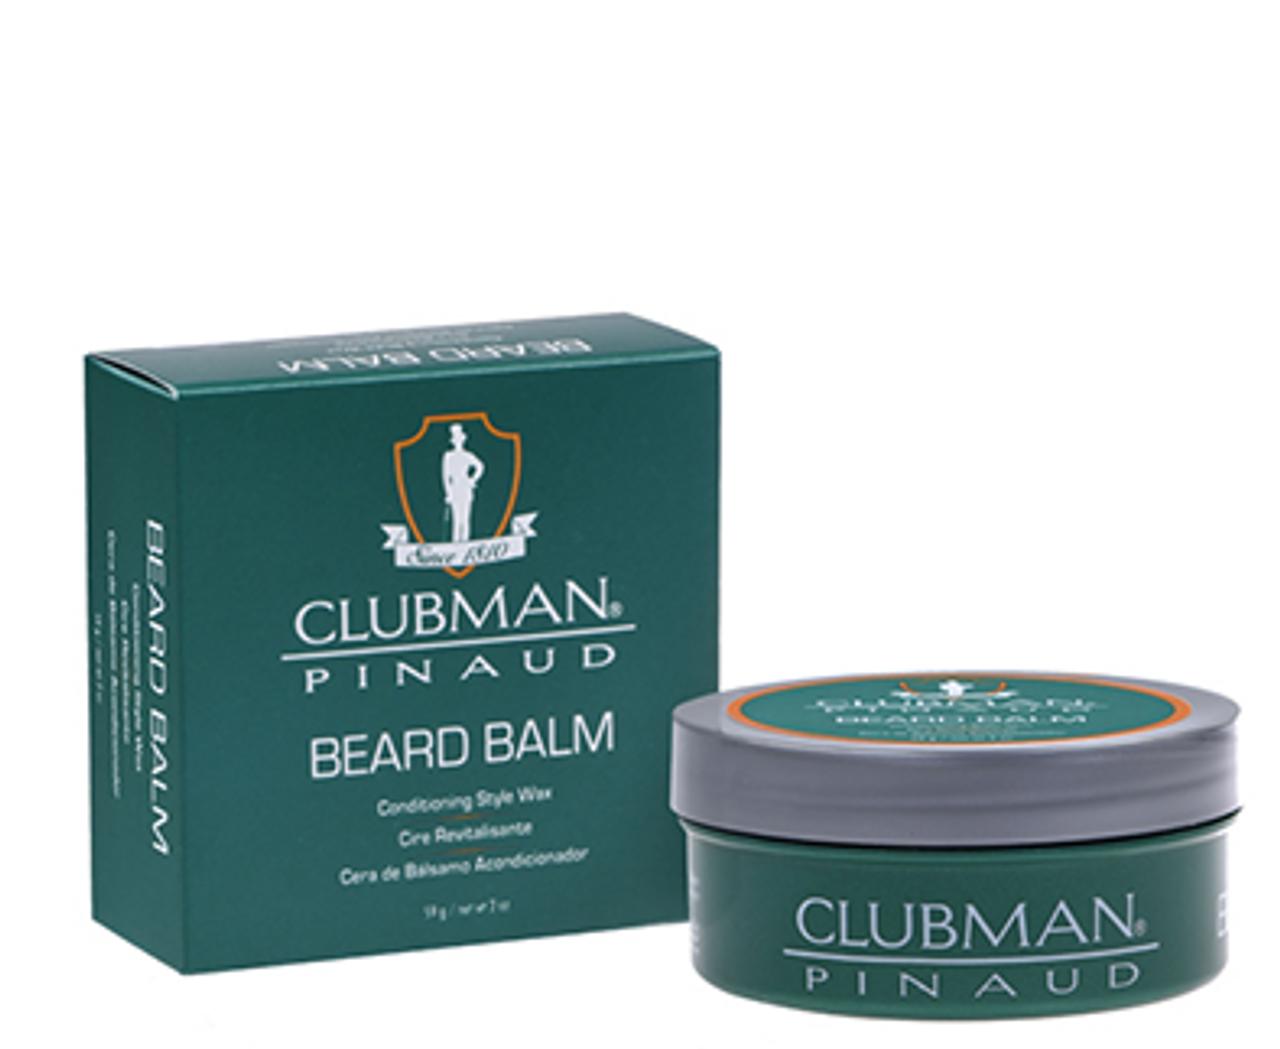 Clubman Beard Balm 2oz